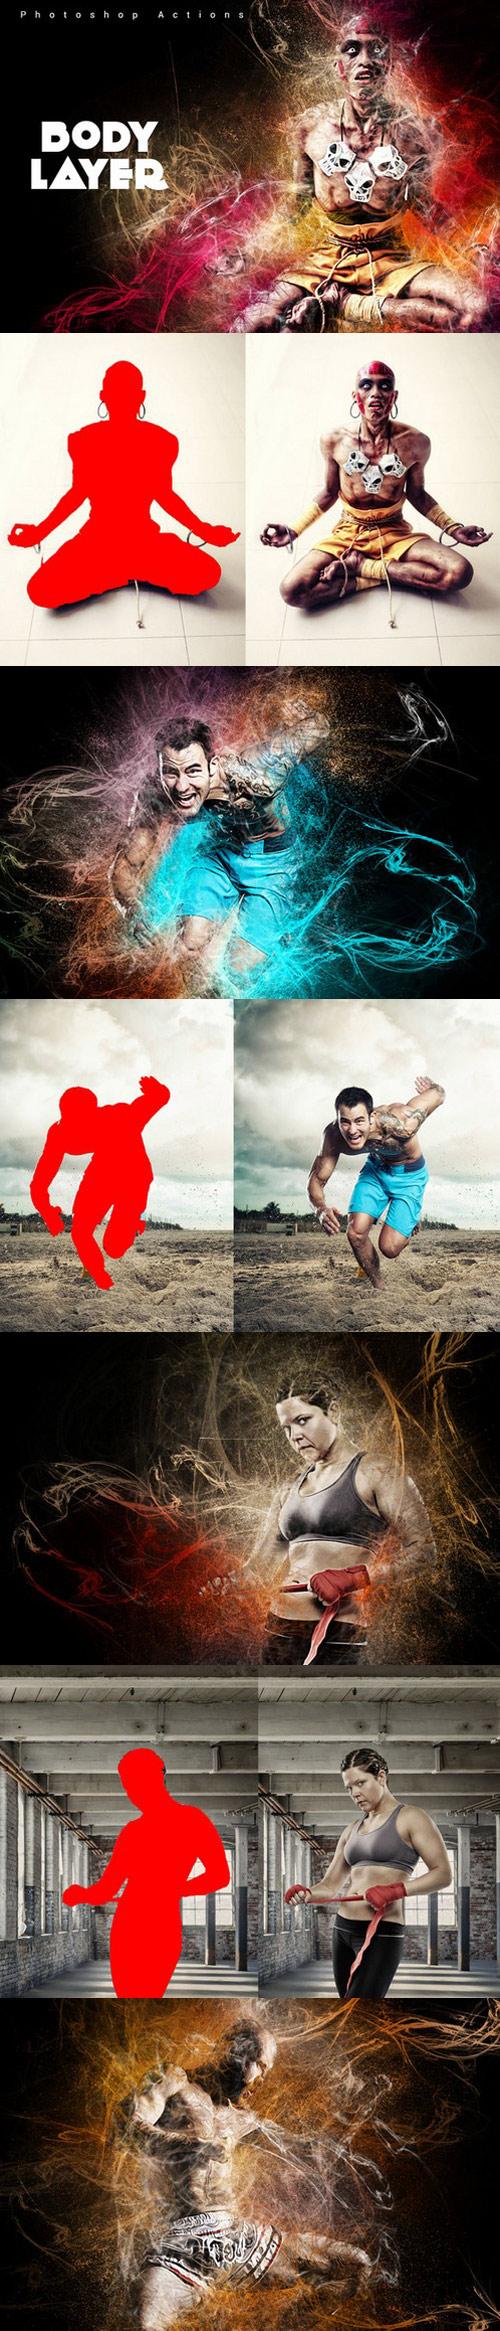 Body-Layers-Photoshop-ActionsGFX.jpg